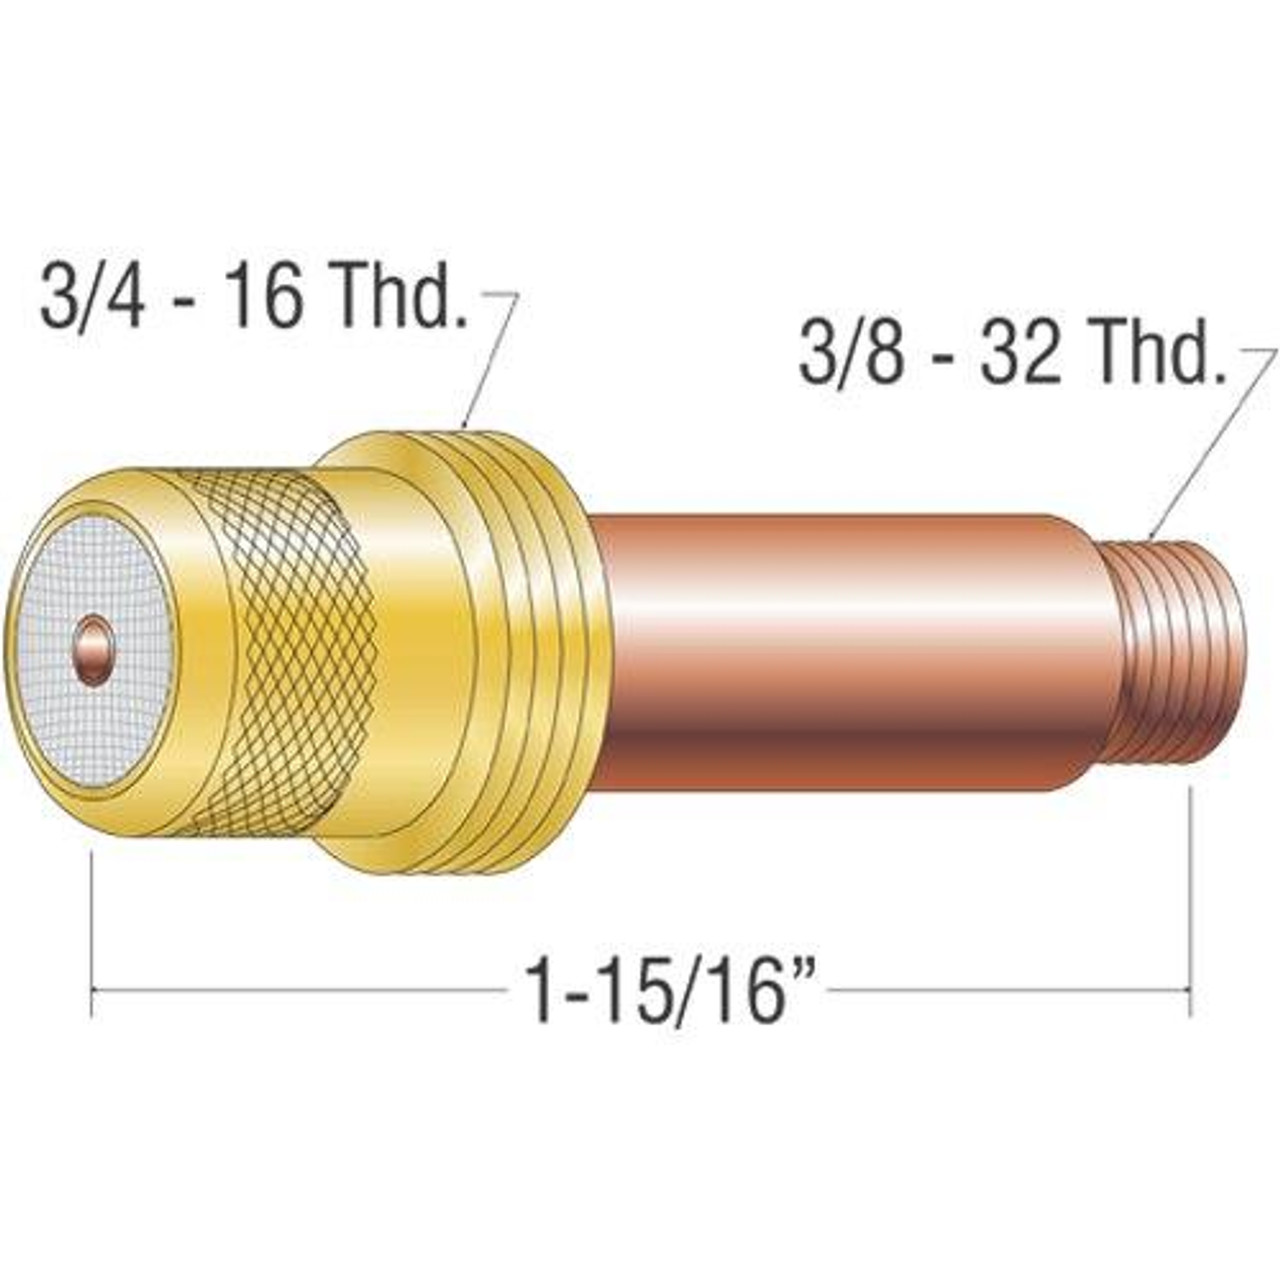 Profax 45V24 Gas Lens .040 17-18-26 Series TIG Torch - 2 Pack